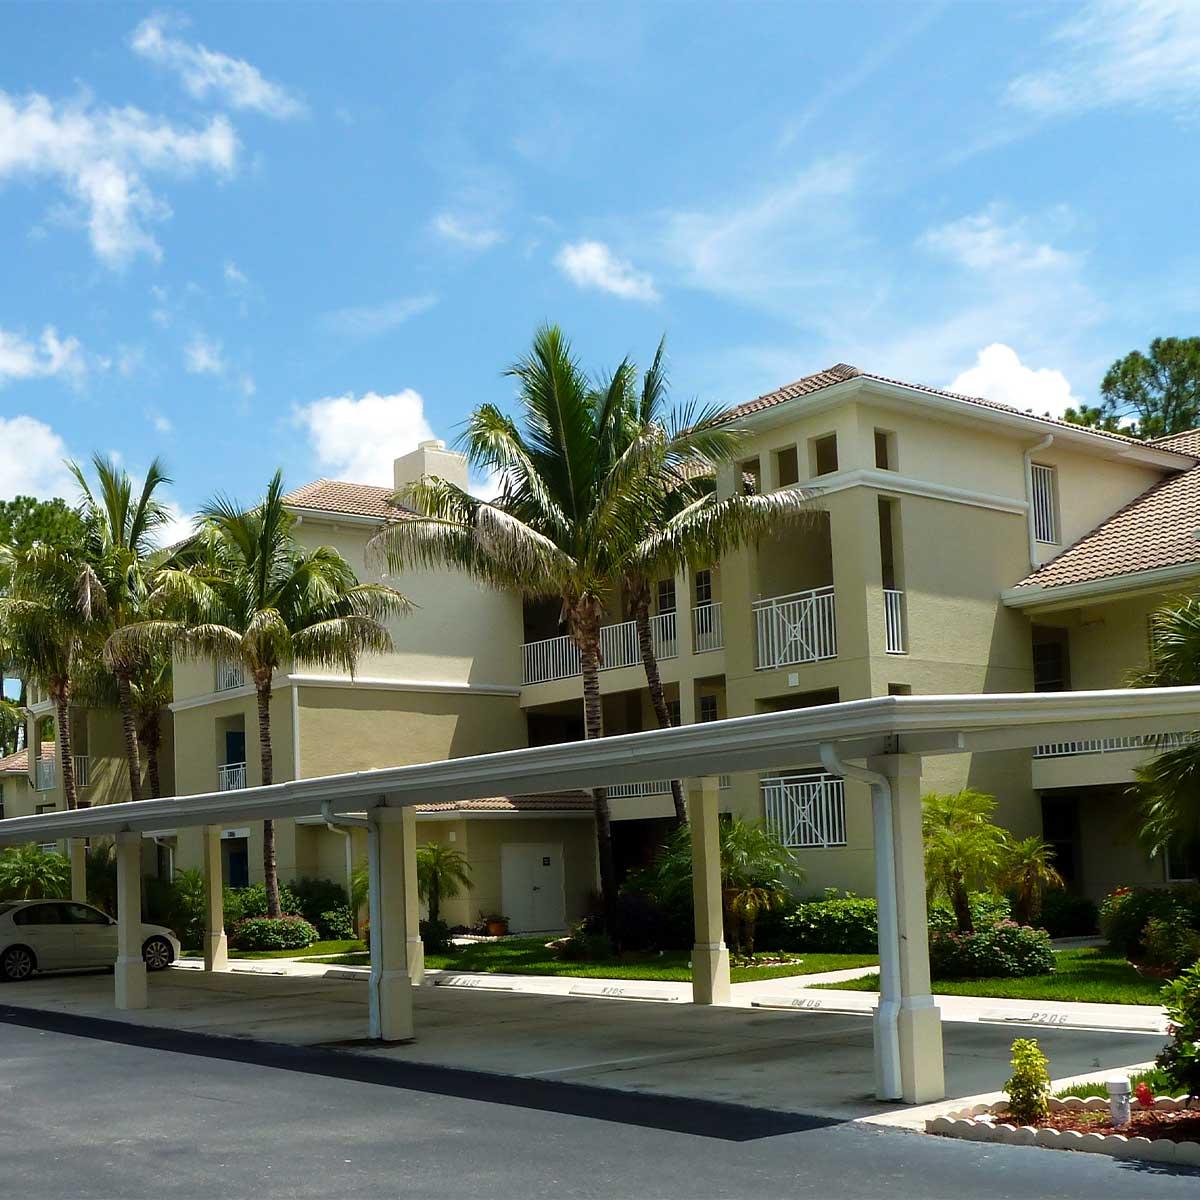 Windward Bay | Tarpon Bay Community Association, Inc. - Naples, Florida